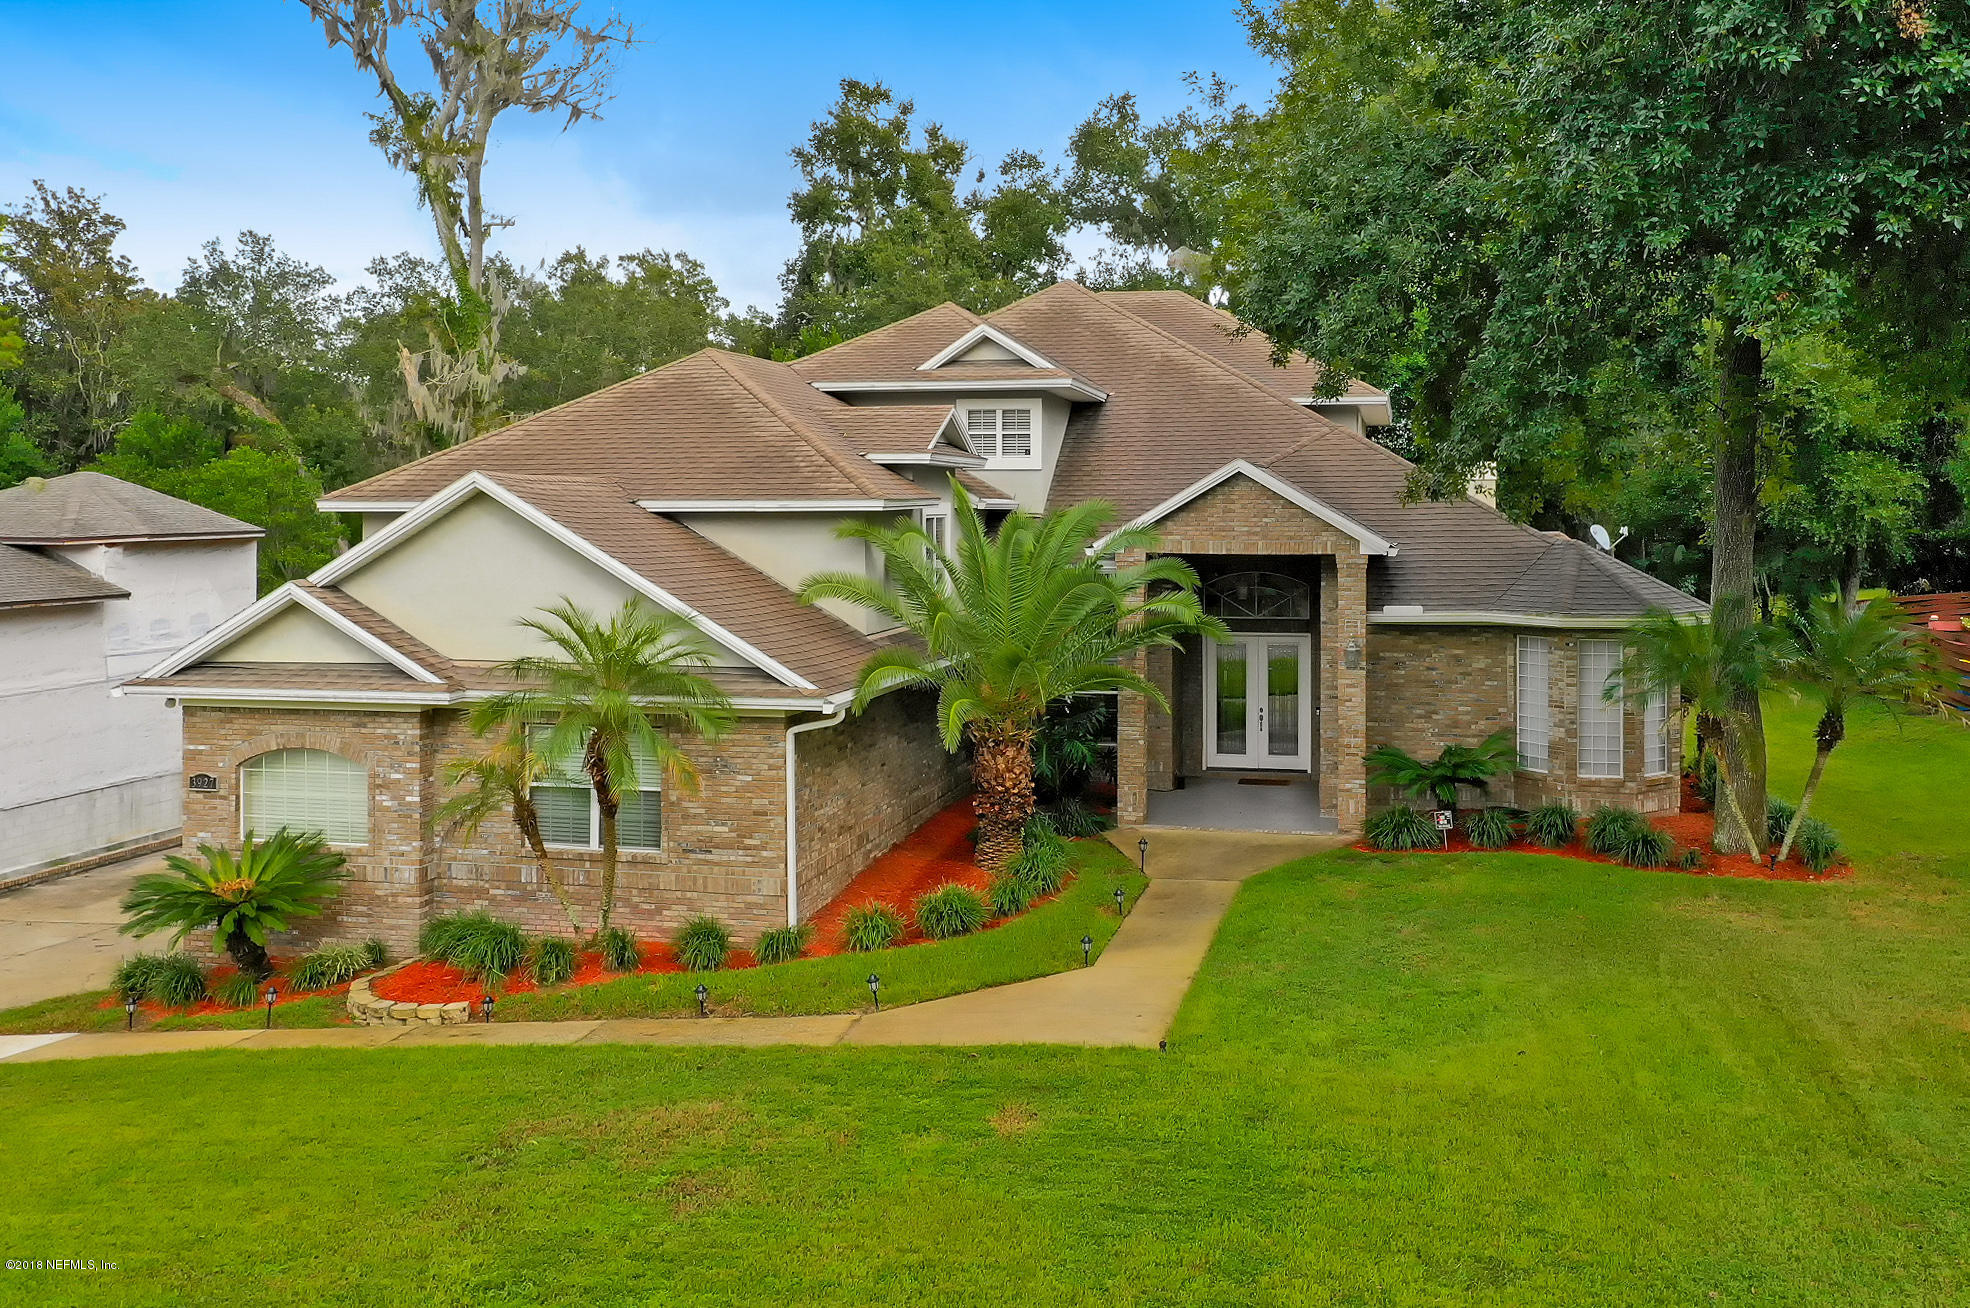 3927 SARAH BROOKE, JACKSONVILLE, FLORIDA 32277, 4 Bedrooms Bedrooms, ,4 BathroomsBathrooms,Residential - single family,For sale,SARAH BROOKE,961554